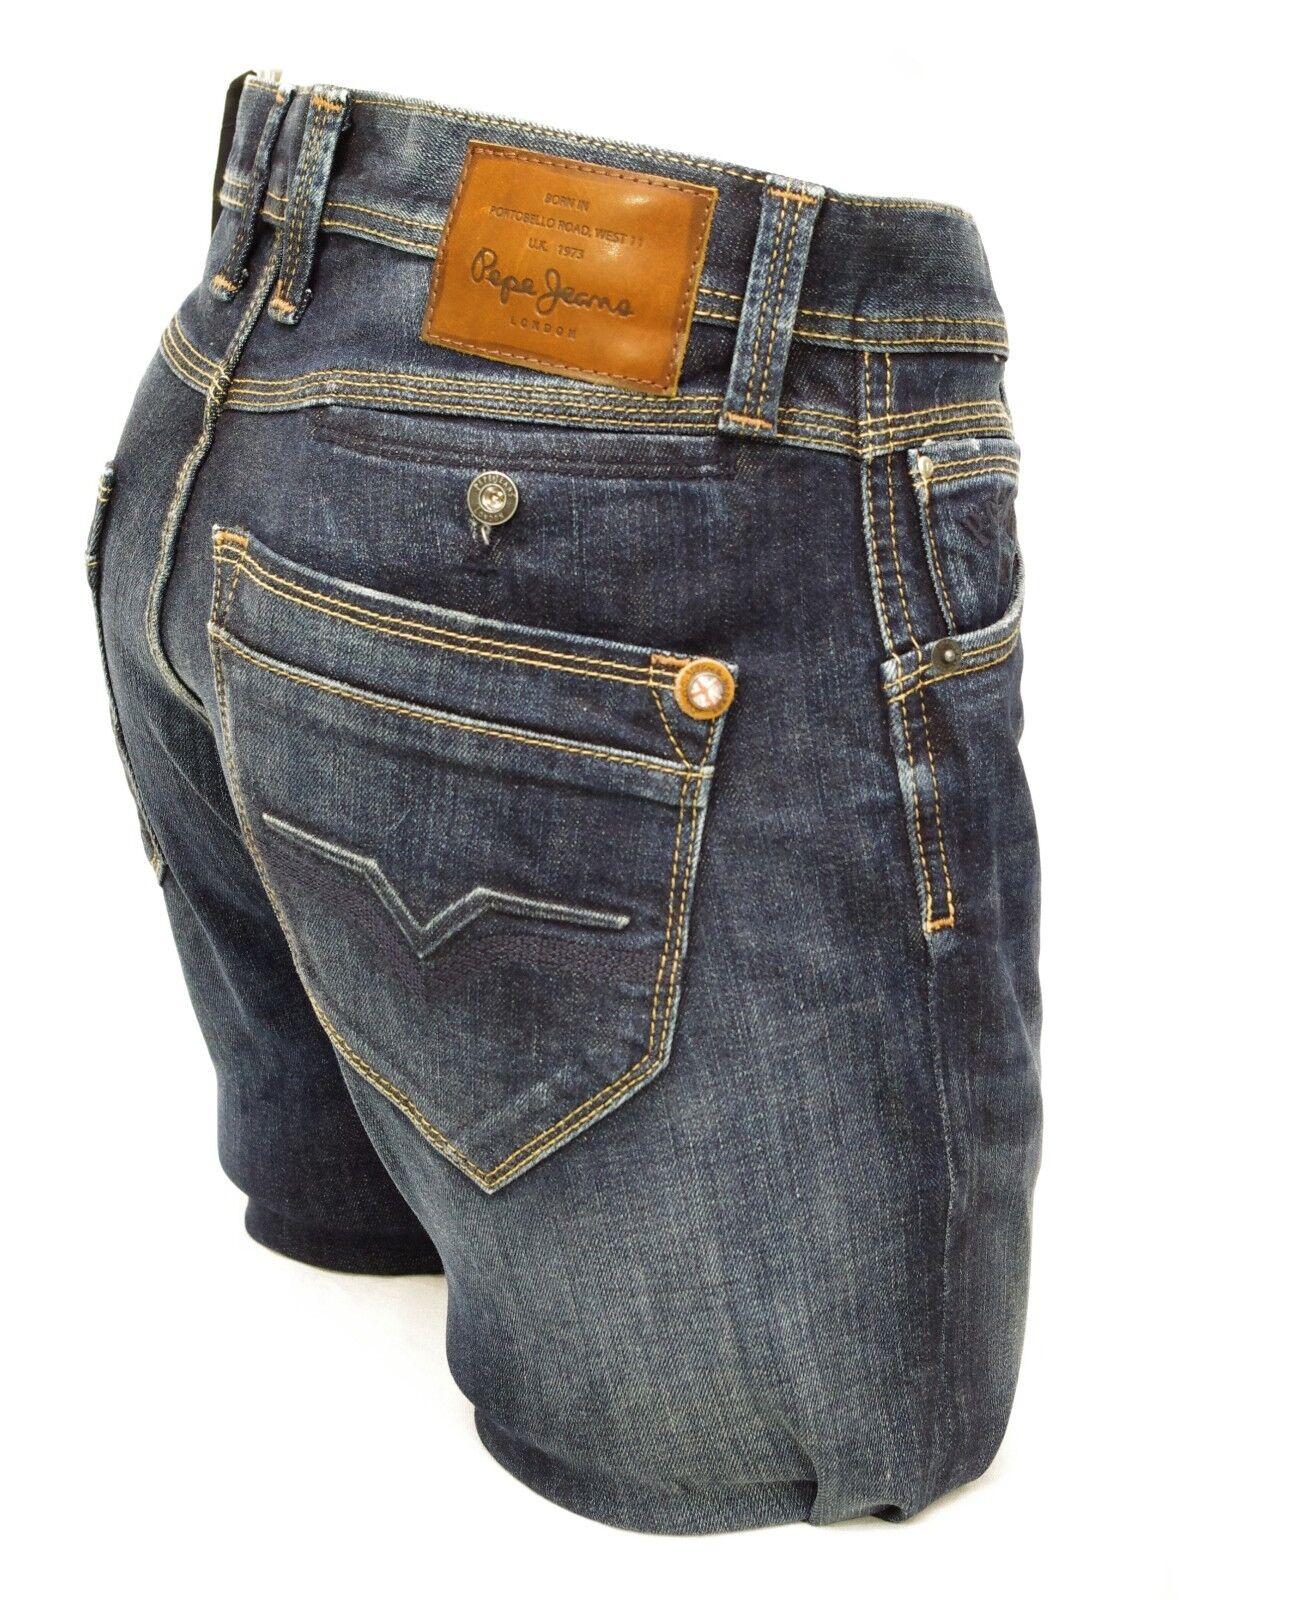 Pepe Jeans Spike Jean Slim Fit Mens Blue Pm200029z45 Low Waist Slim Leg Ebay